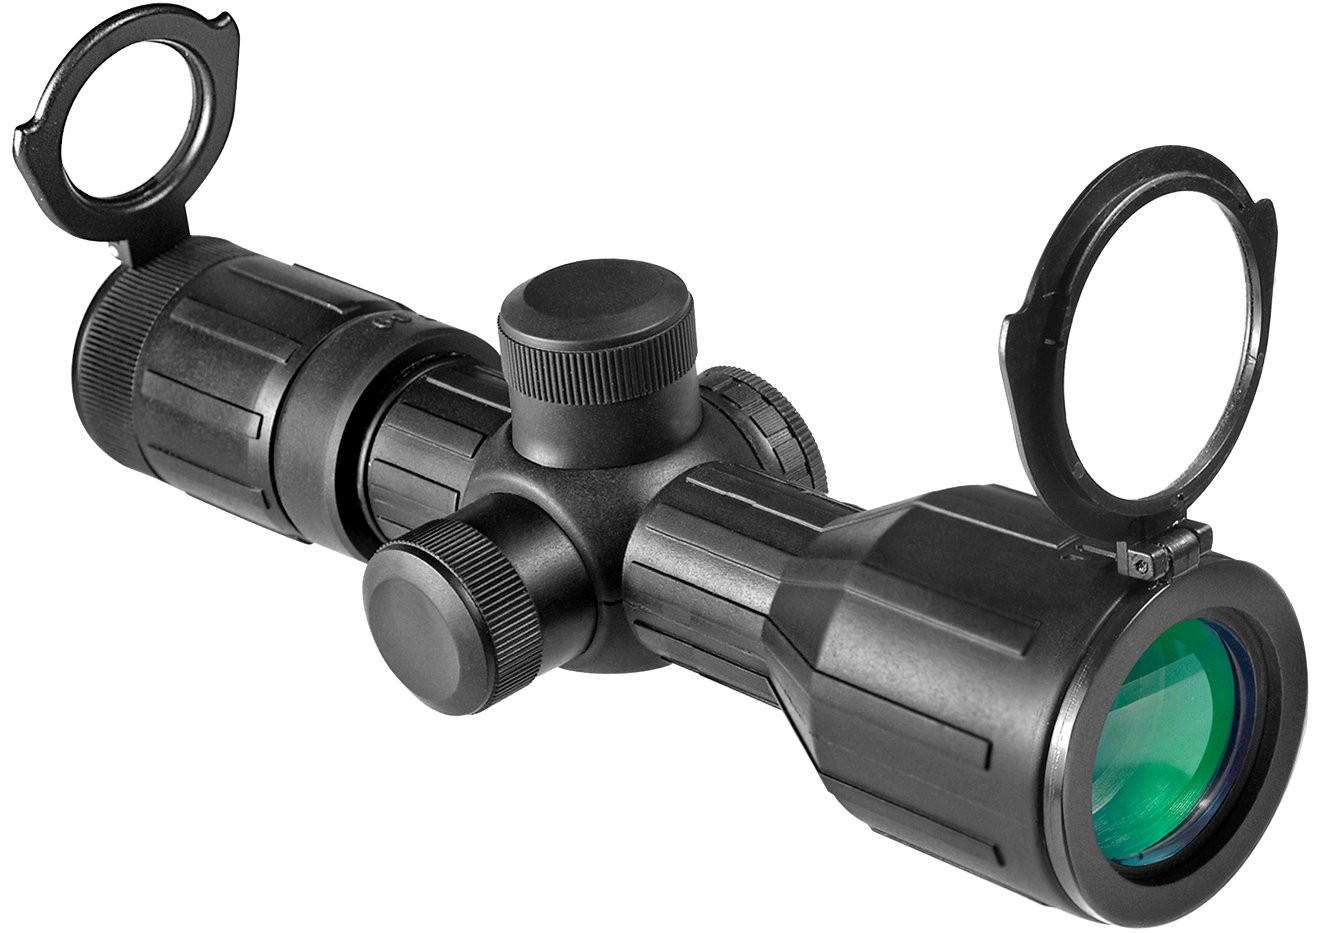 BARSKA 3-9x40 Compact Contour IR 4A Mil Plex Riflescope by BARSKA